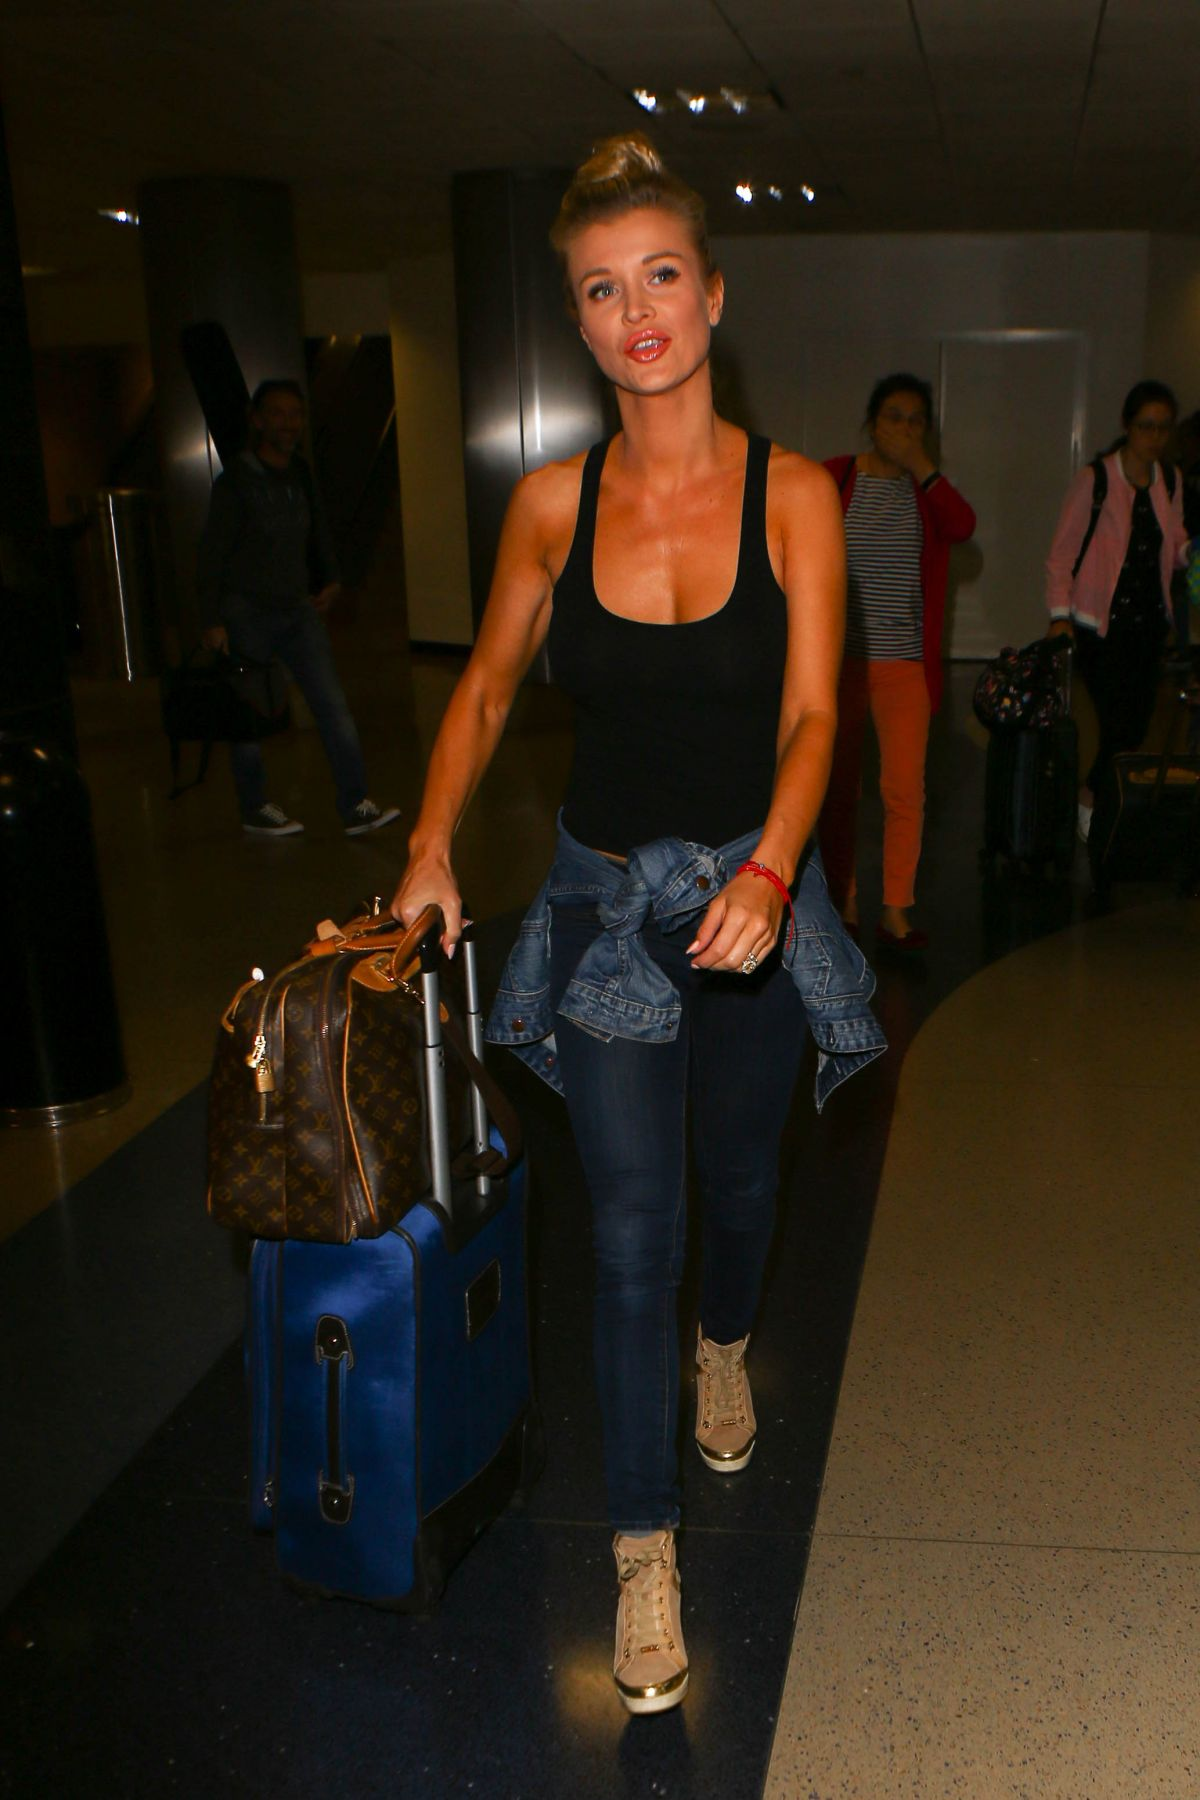 JOANNA KRUPA at LAX Airport in Los Angeles 05/13/2016